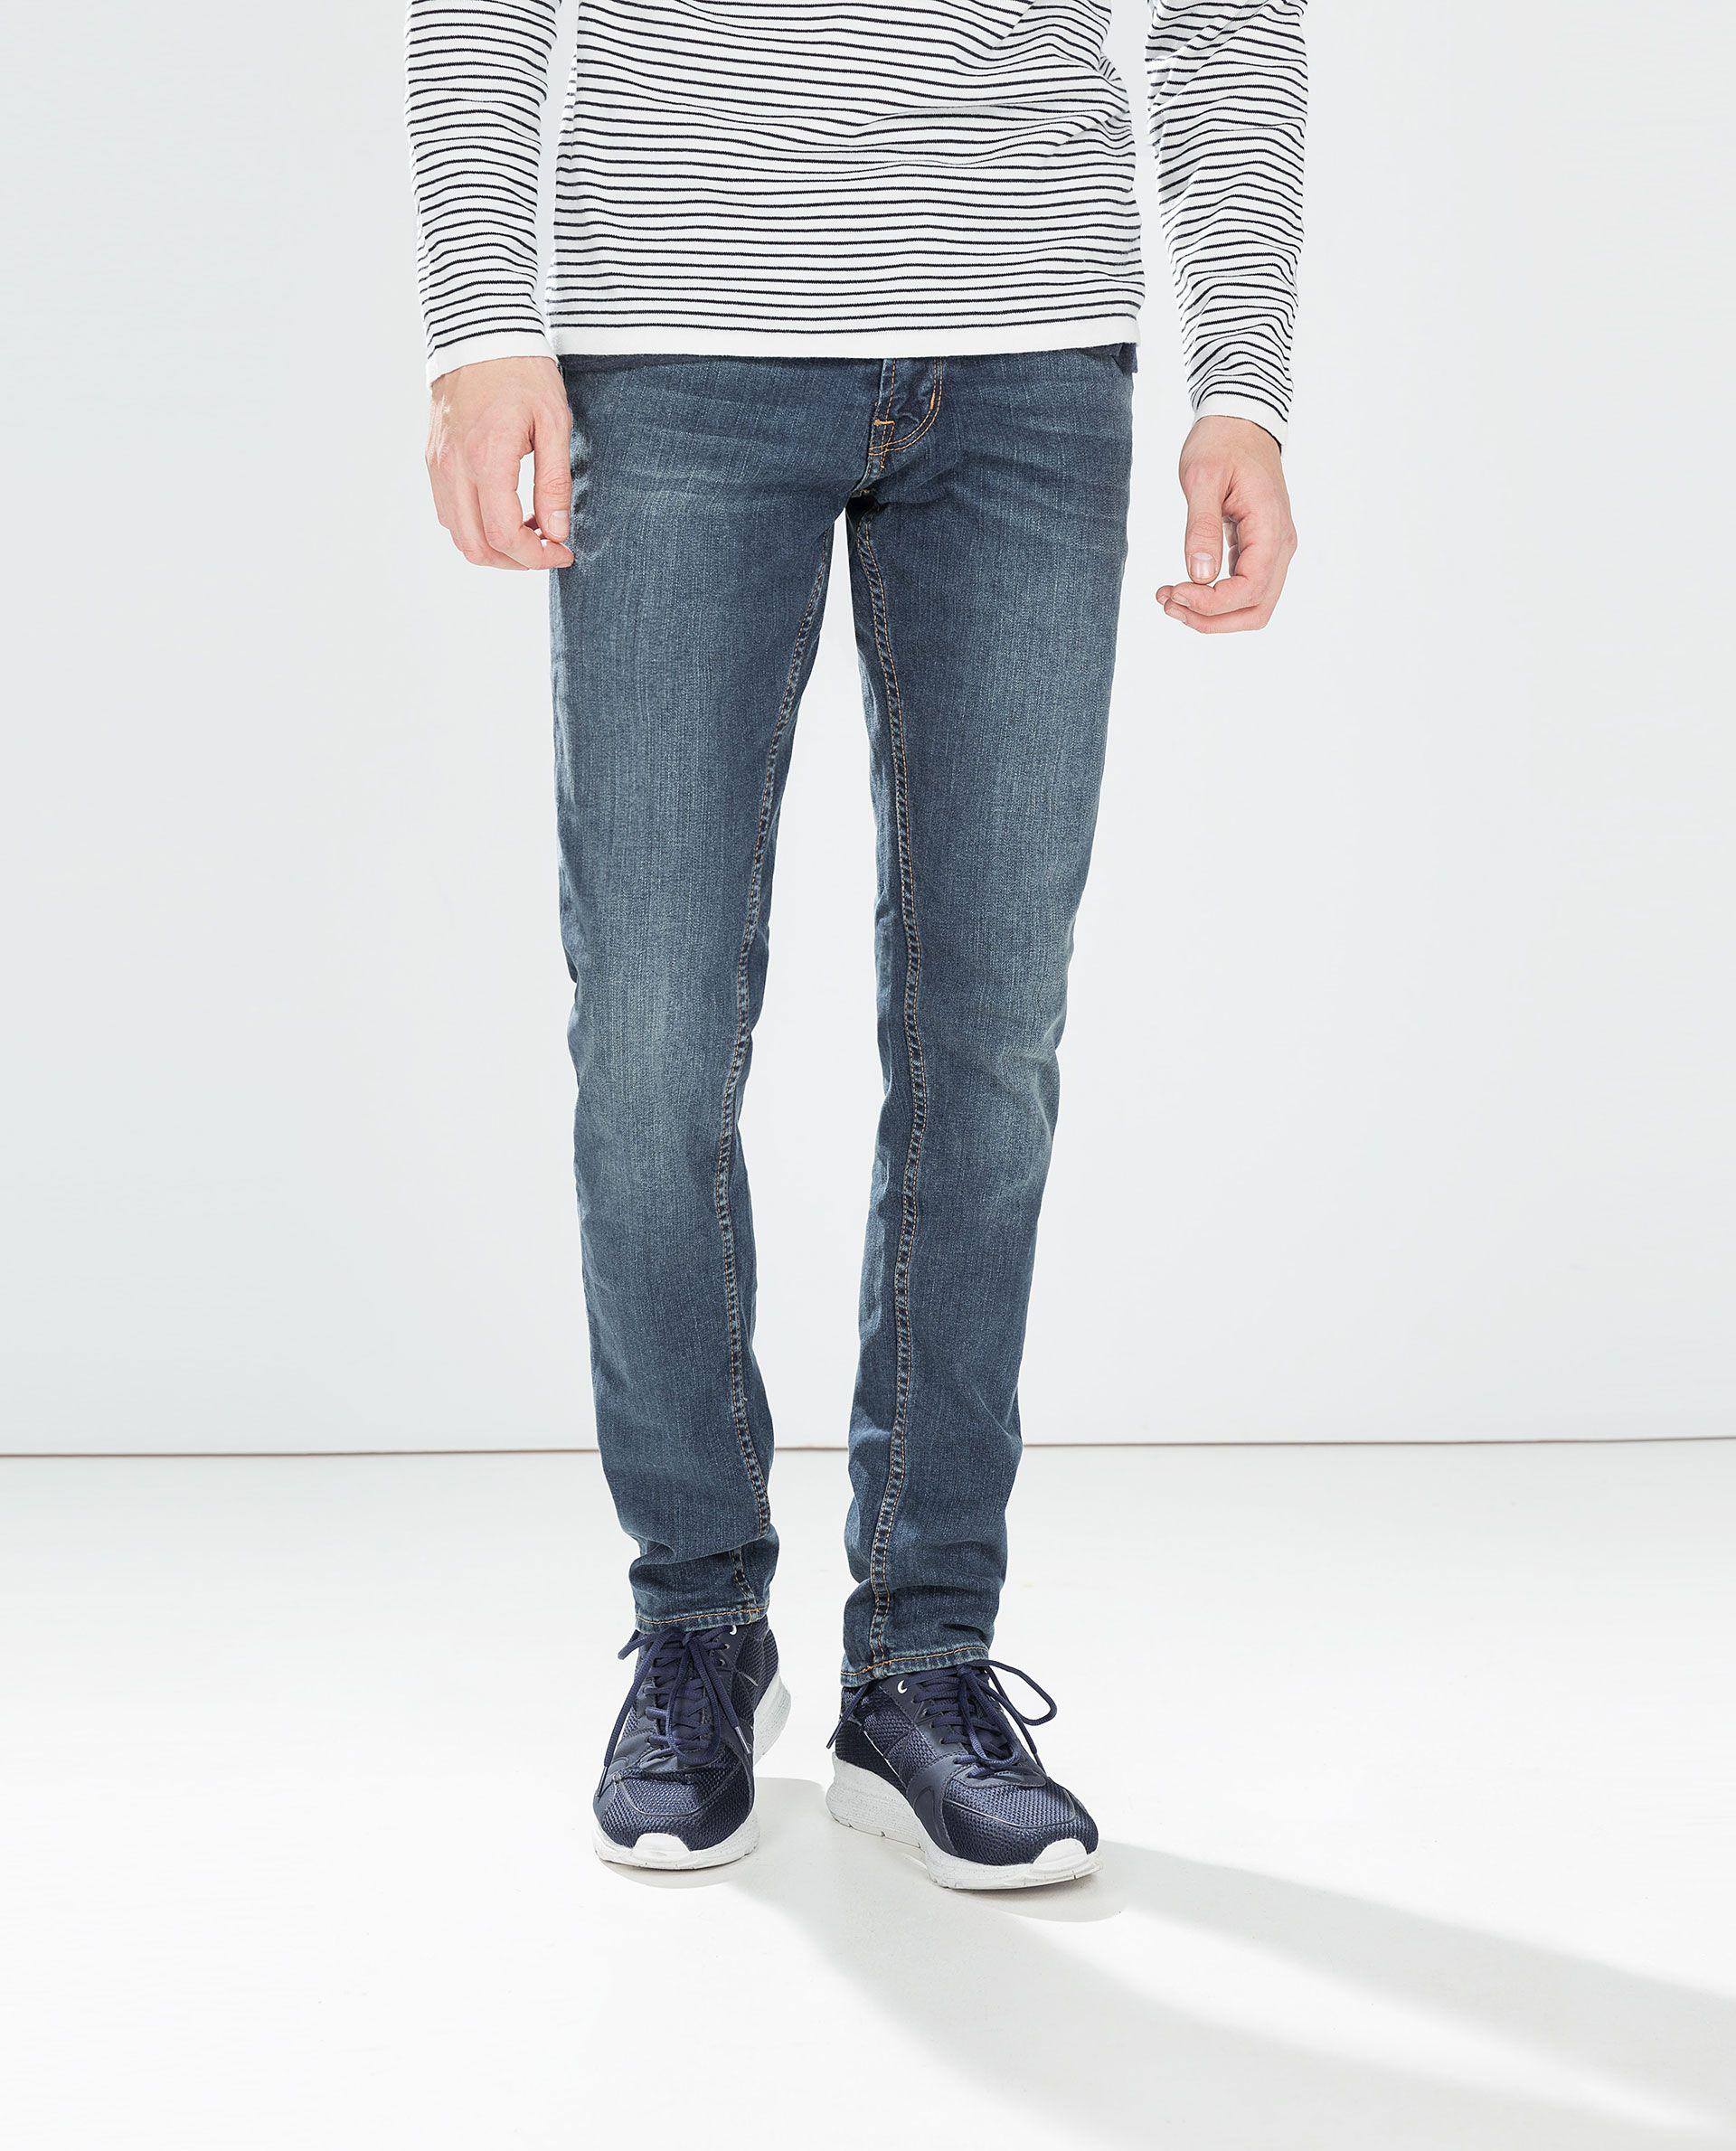 56aec64b SLIM JEANS - Slim Fit - Jeans - MAN | ZARA Egypt | Zara | Jeans ...